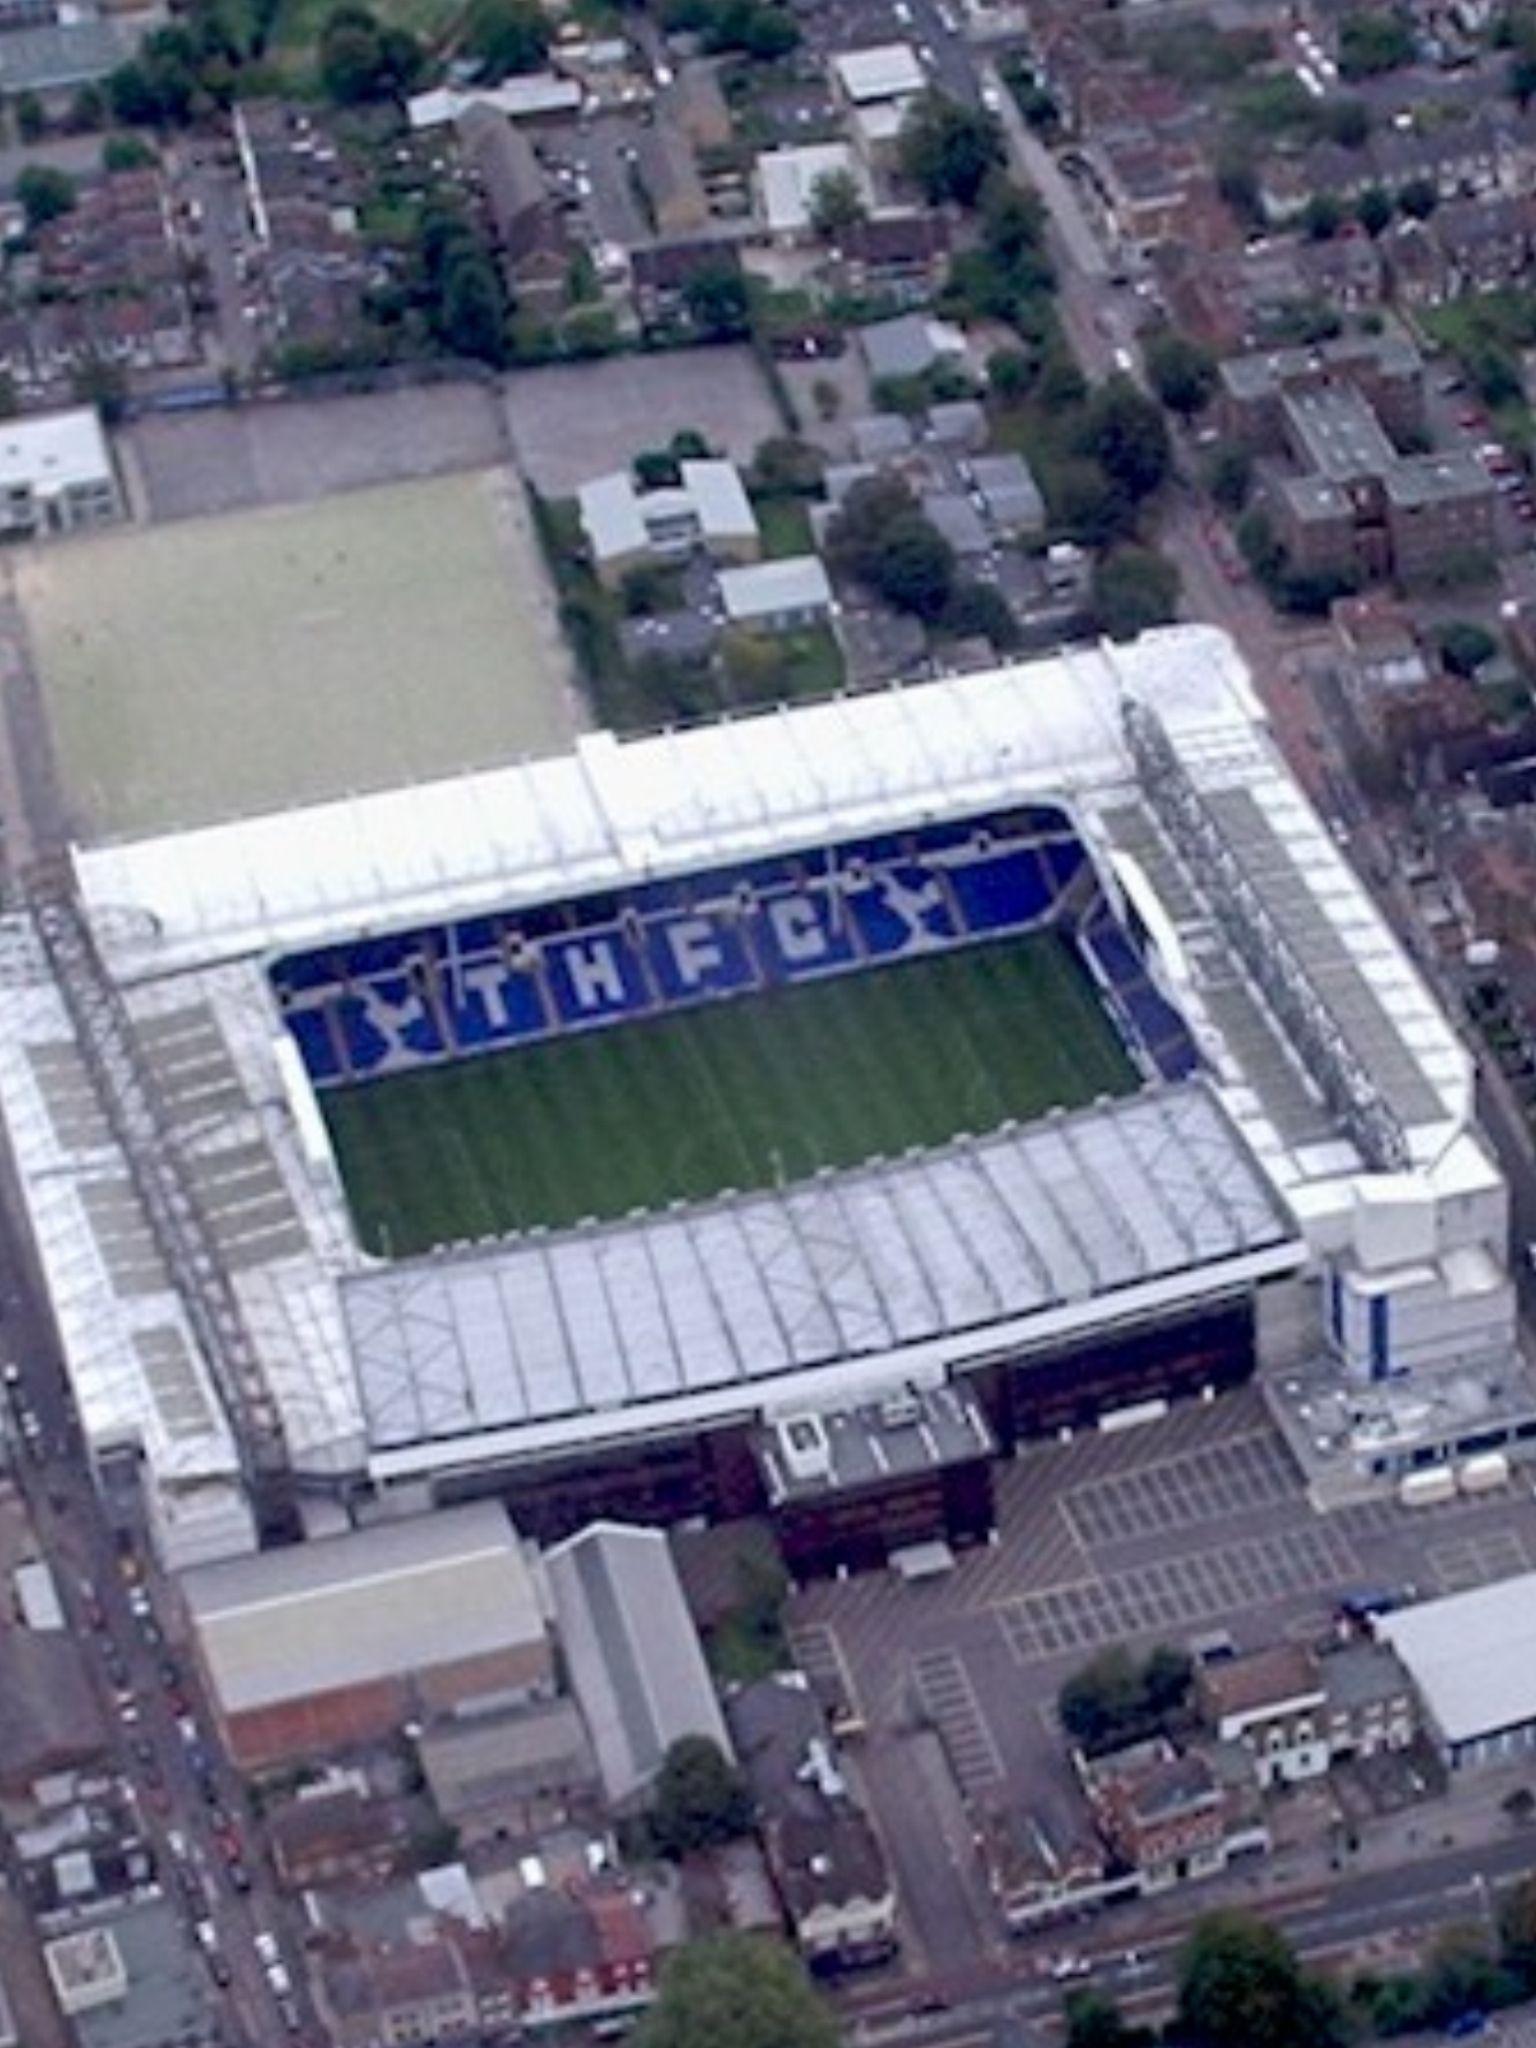 White Hart Lane-Tottenham Hotspur